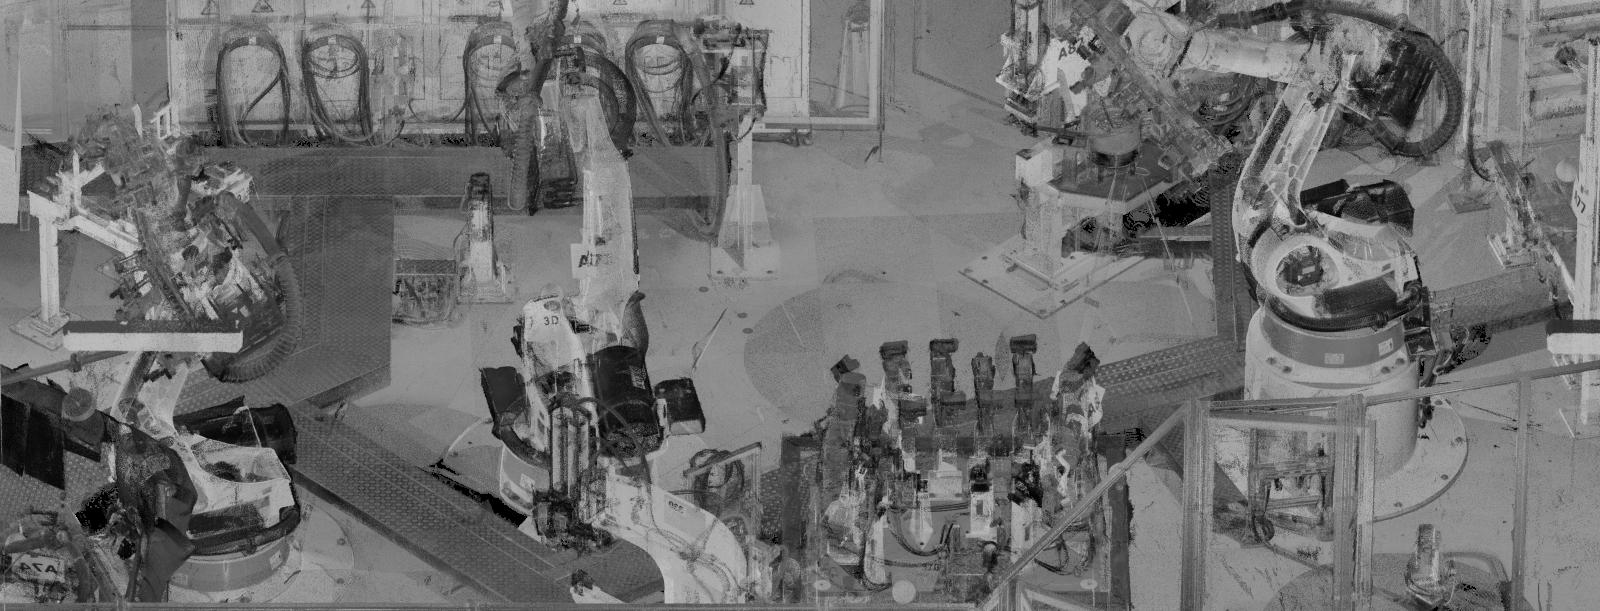 Laserscan Roboterzelle